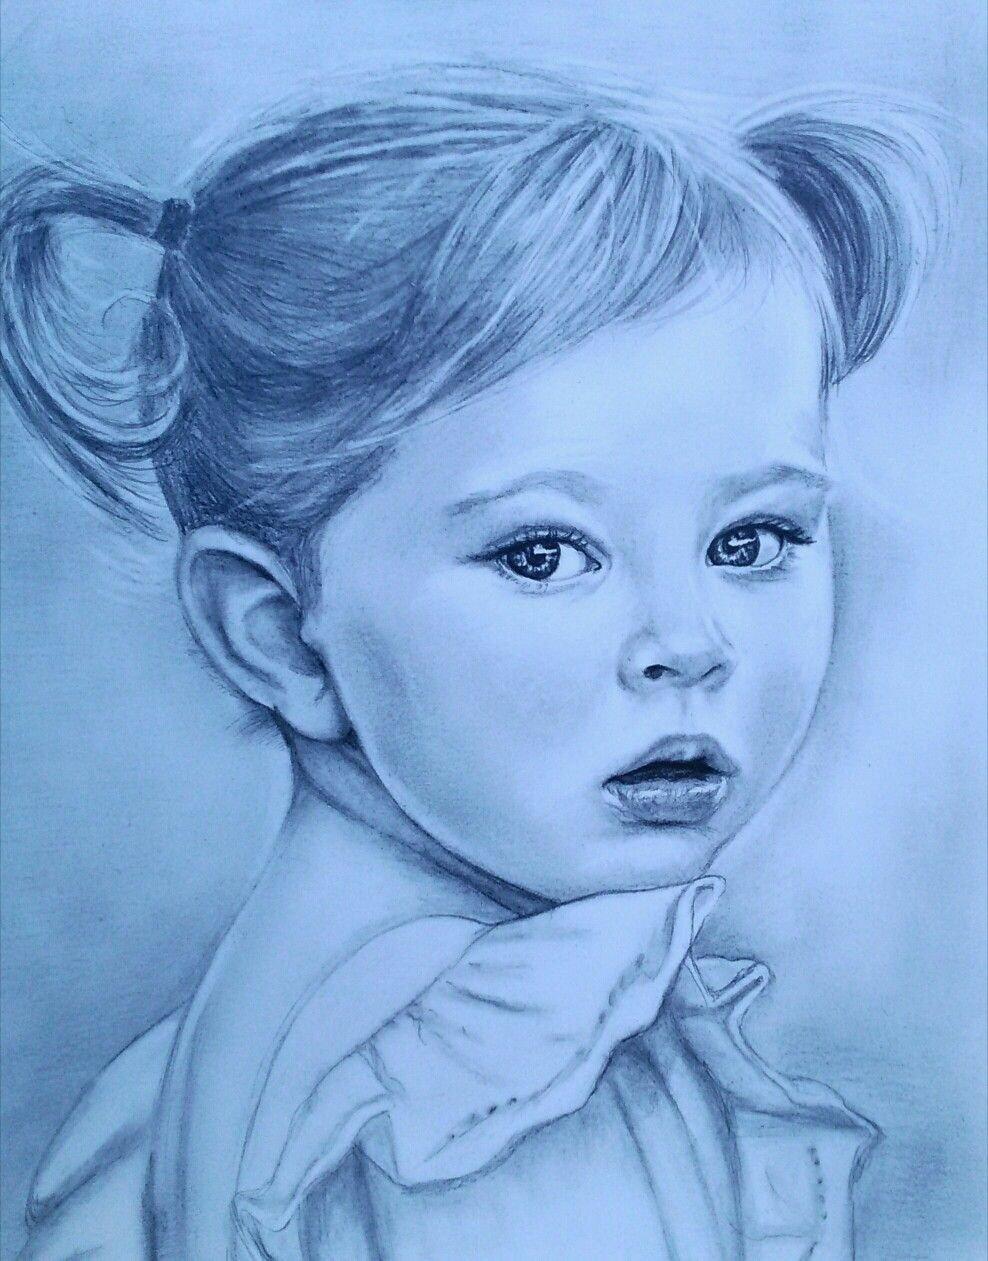 Картинка ребенка нарисованная карандашом